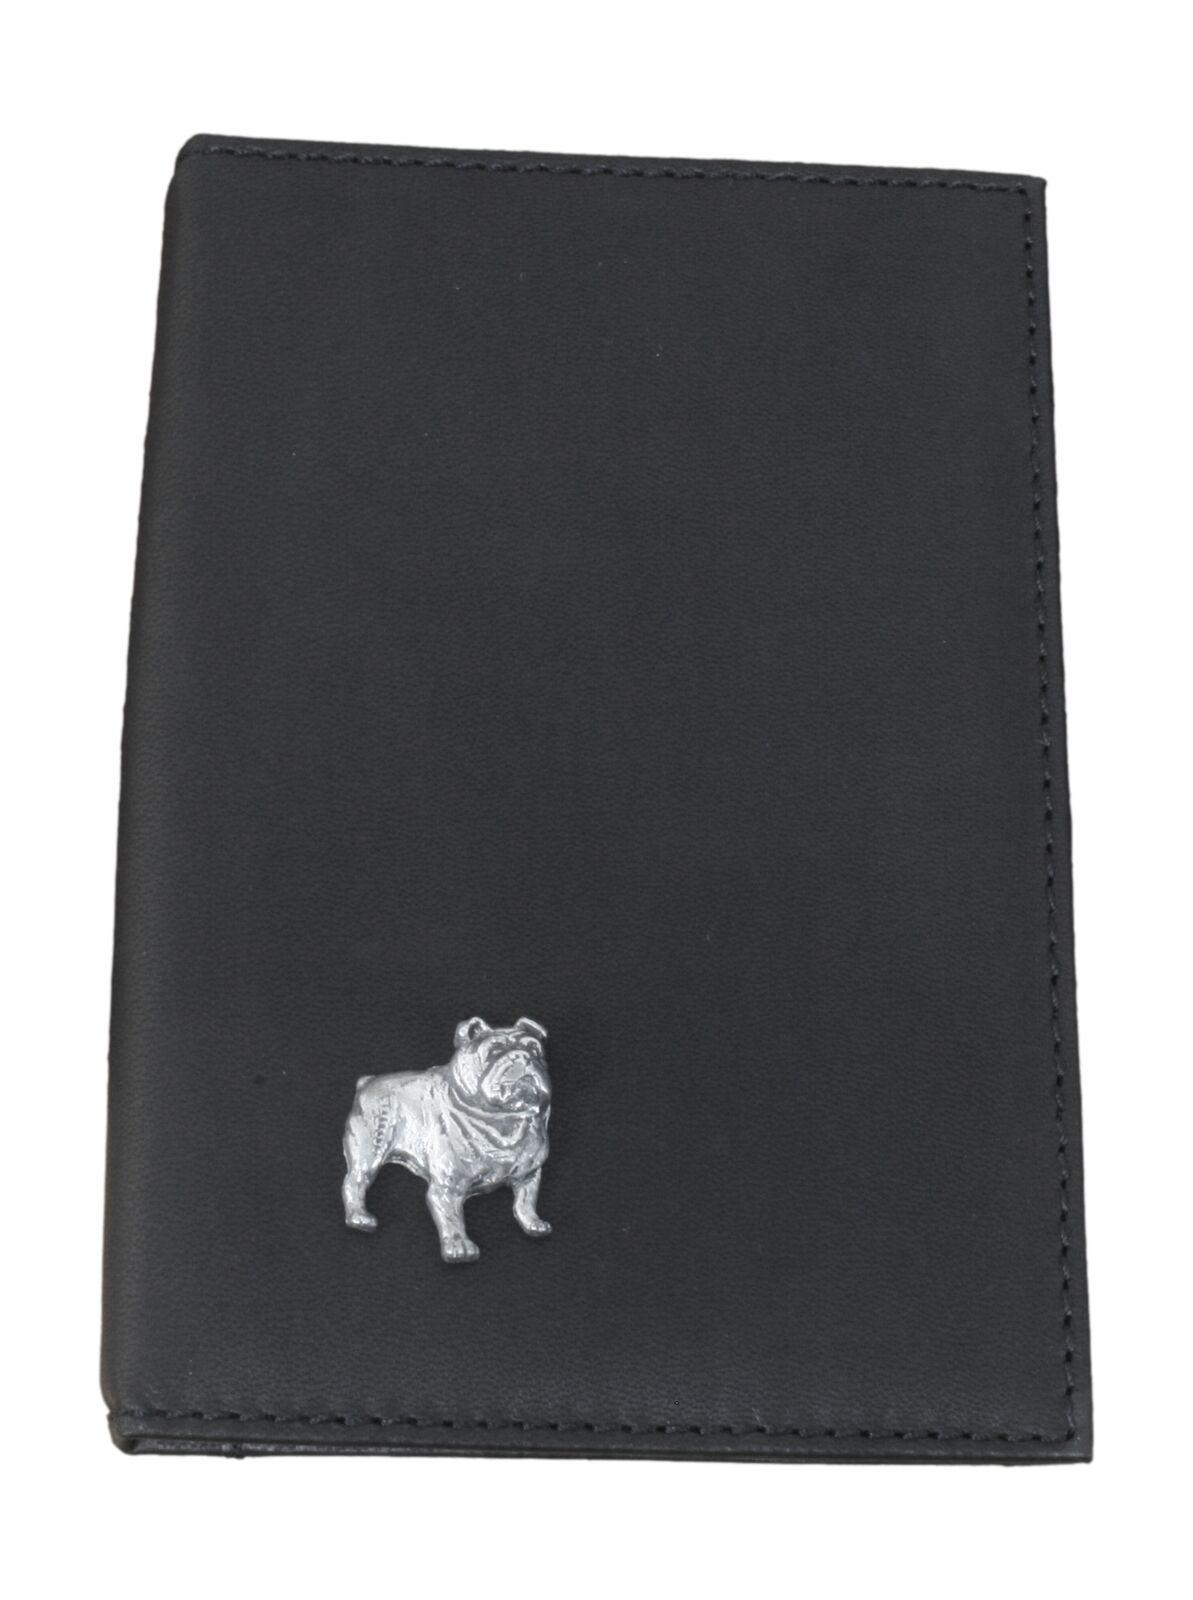 Bulldog Black Leather Shotgun/Firearms Certificate Holder 47